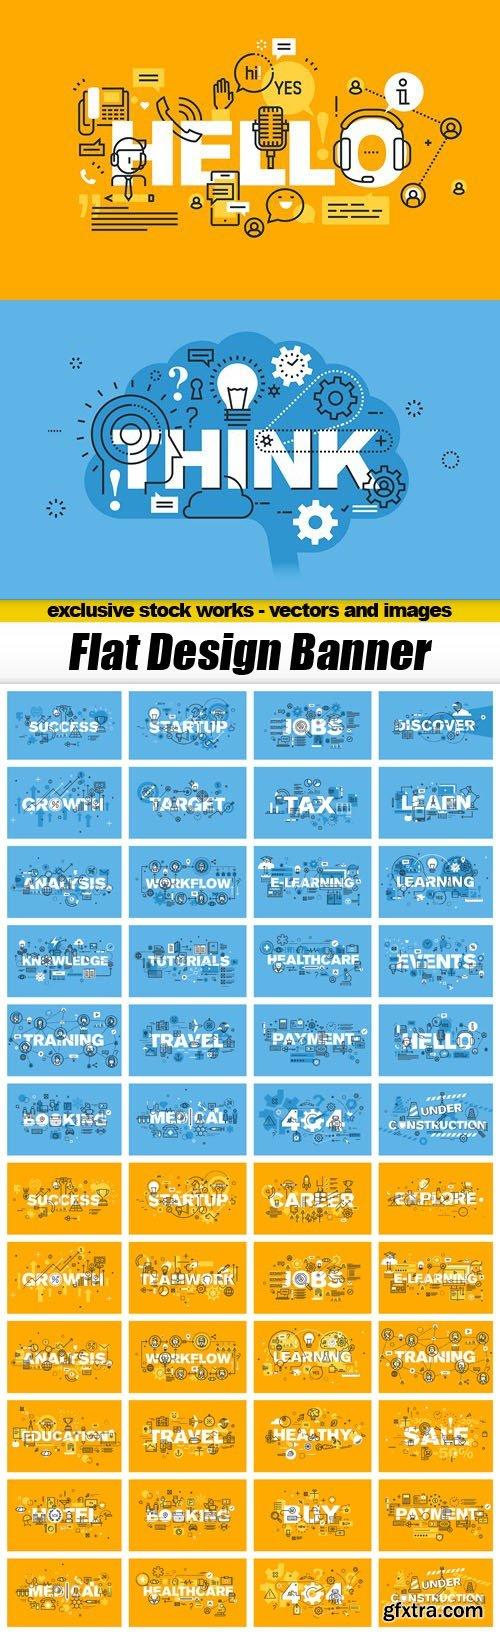 Flat Design Banner - 50xEPS